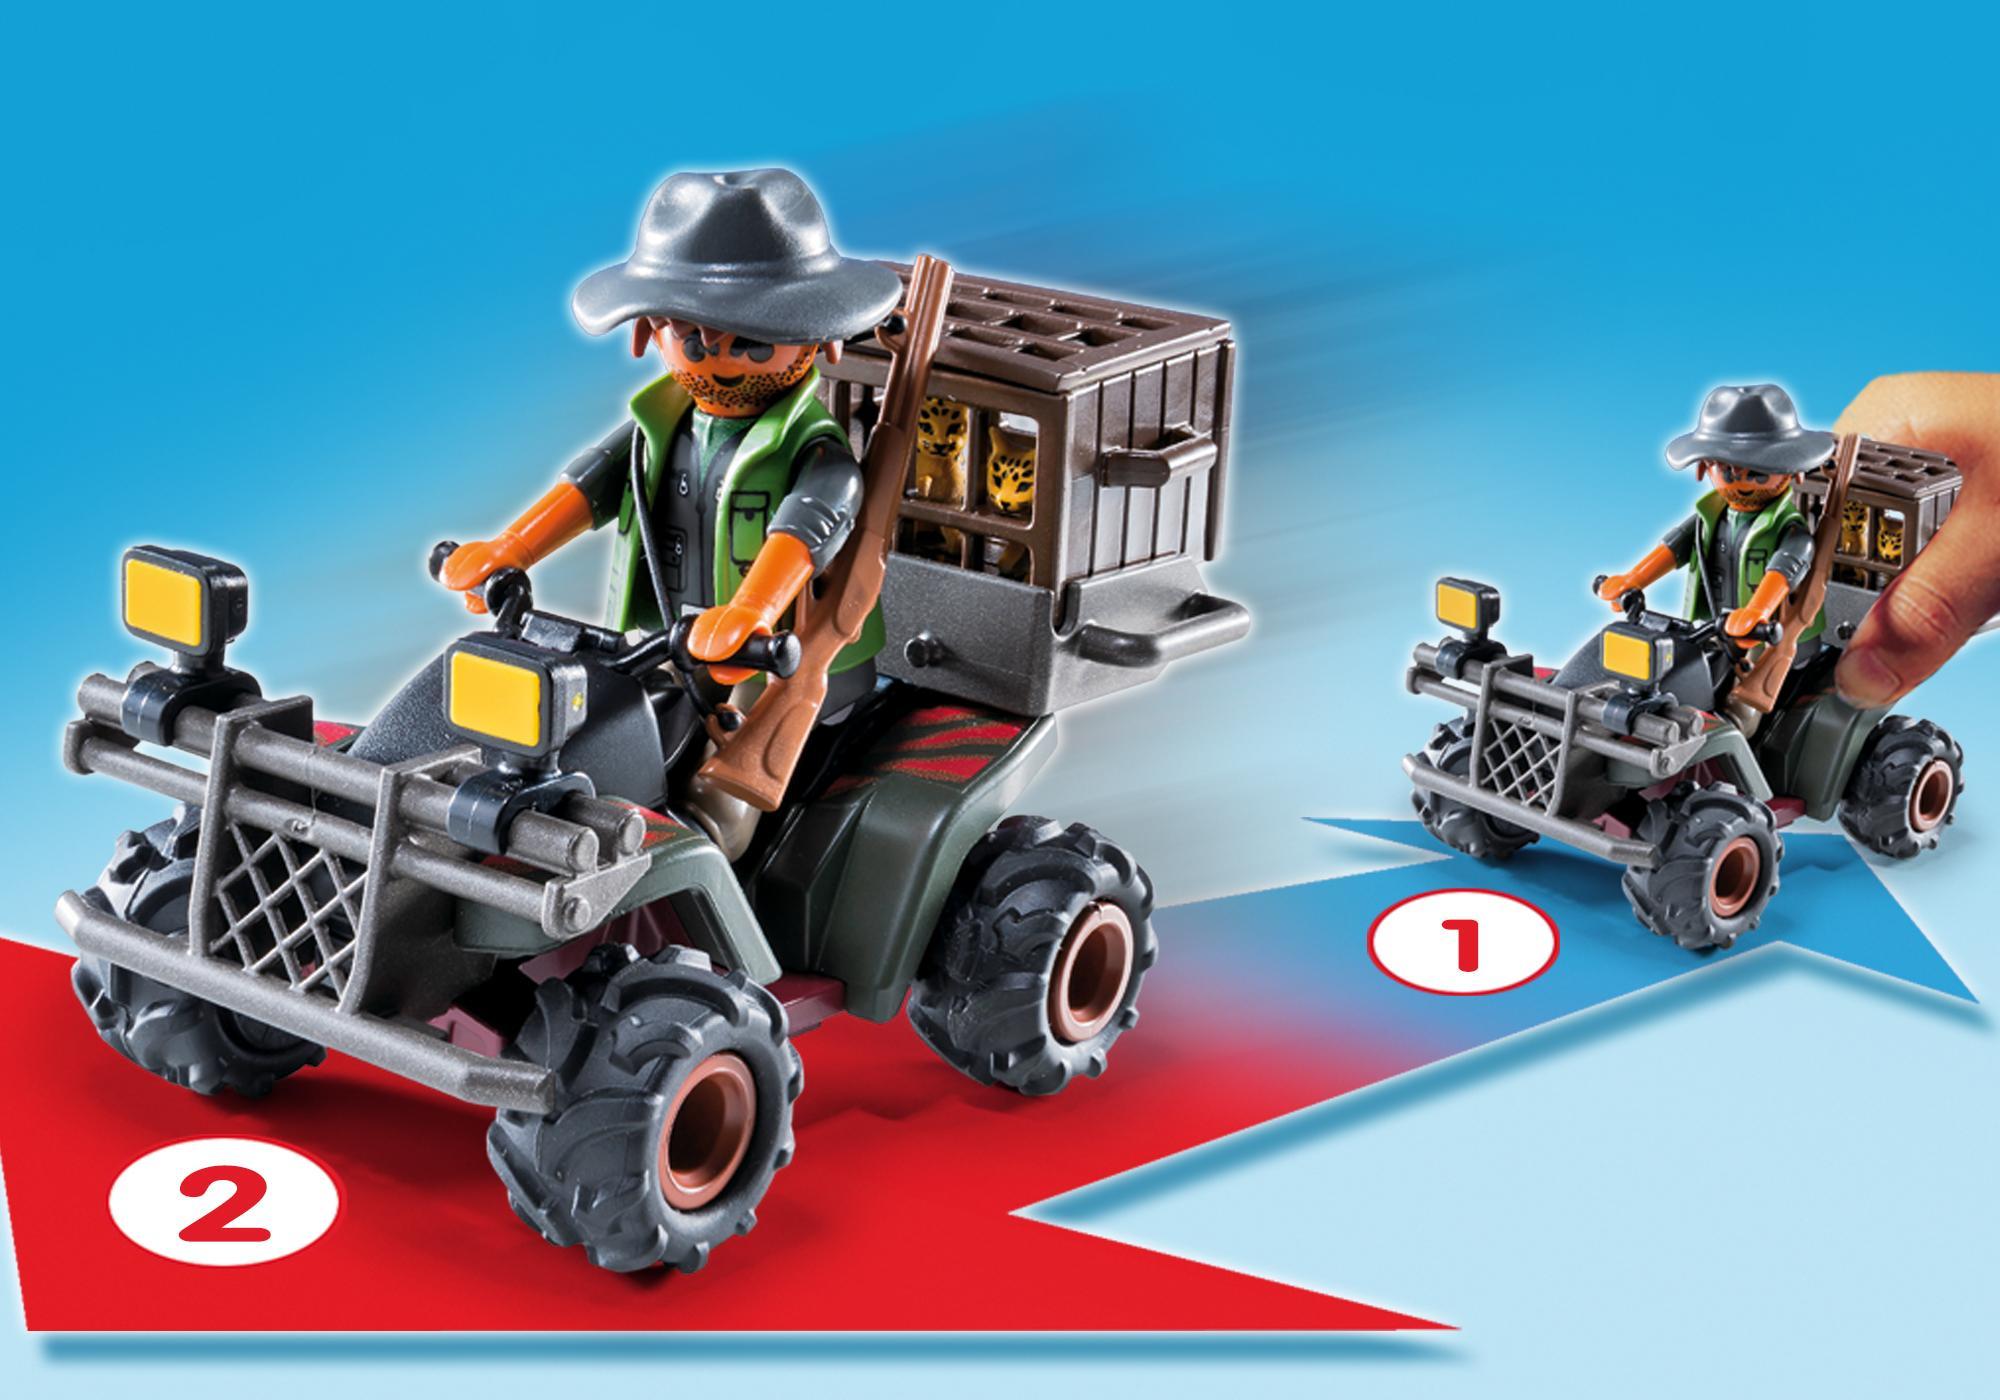 http://media.playmobil.com/i/playmobil/6939_product_extra1/Bracconiere con quad